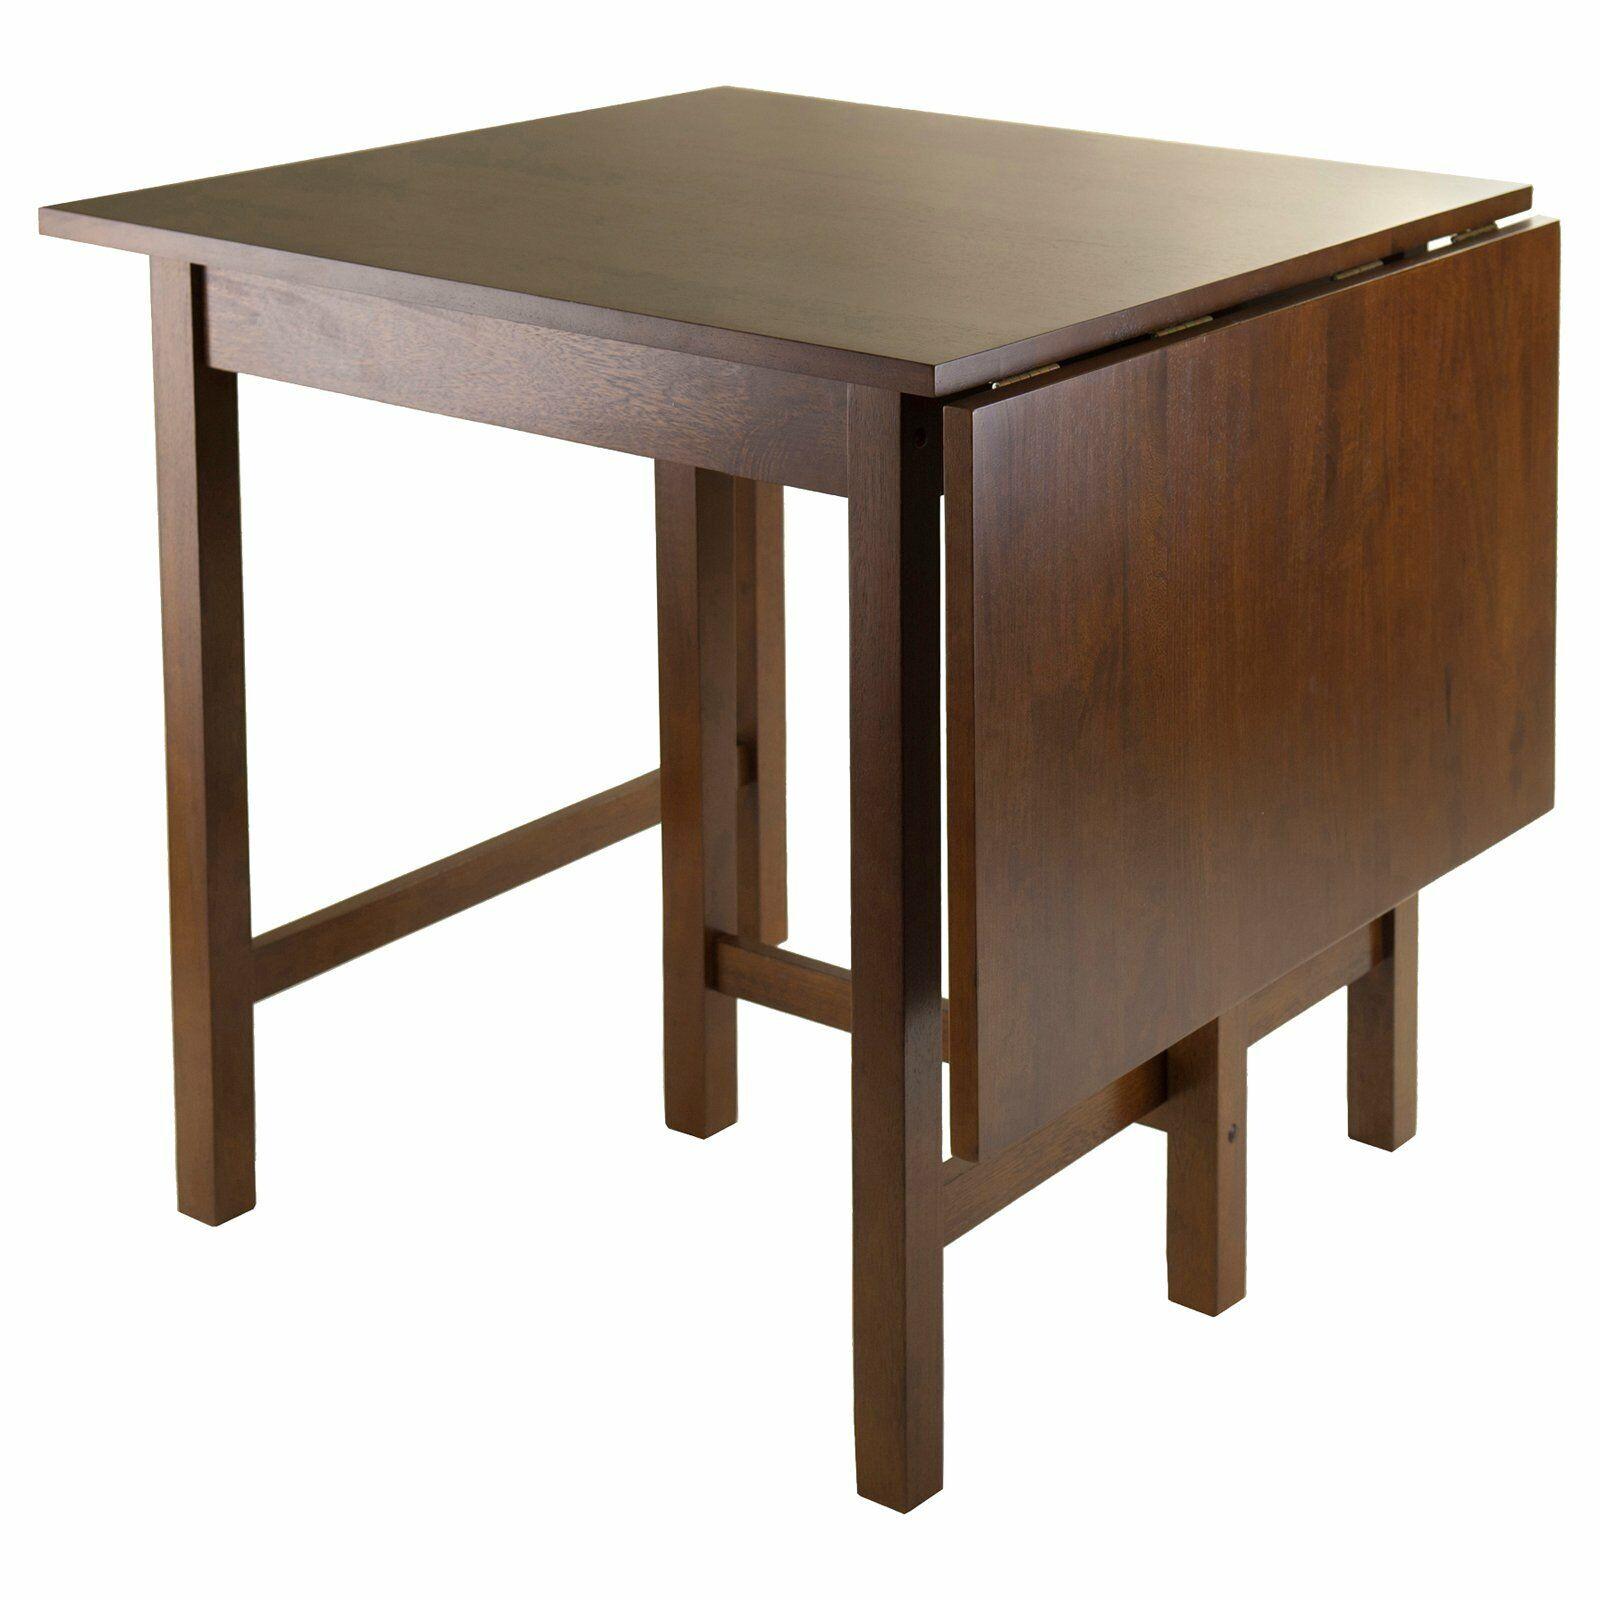 Drop Leaf Dining Table Solid Wood Brown